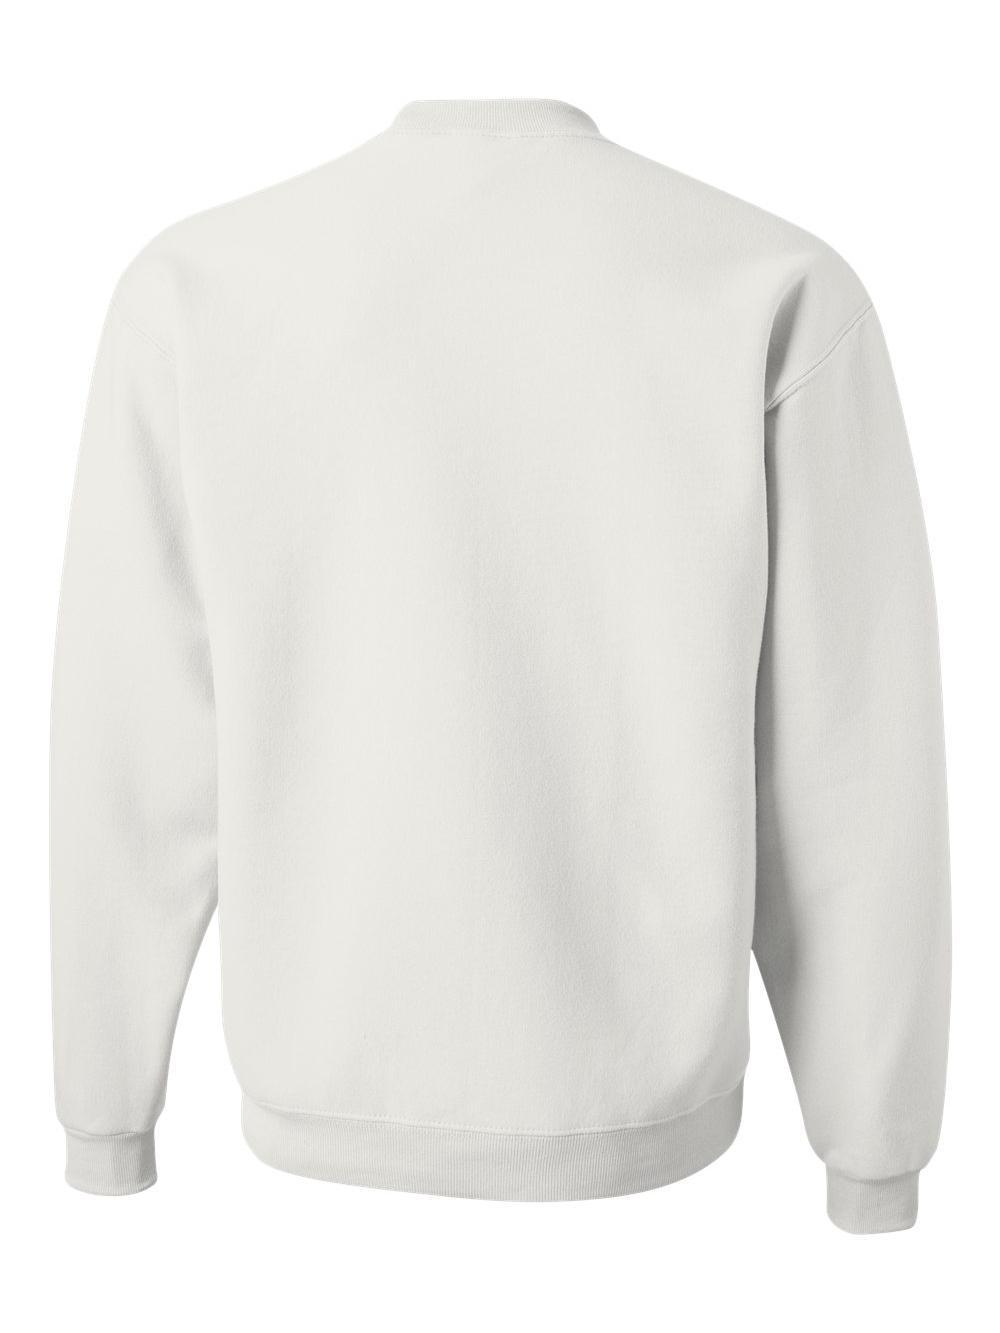 Jerzees-NuBlend-Crewneck-Sweatshirt-562MR thumbnail 103